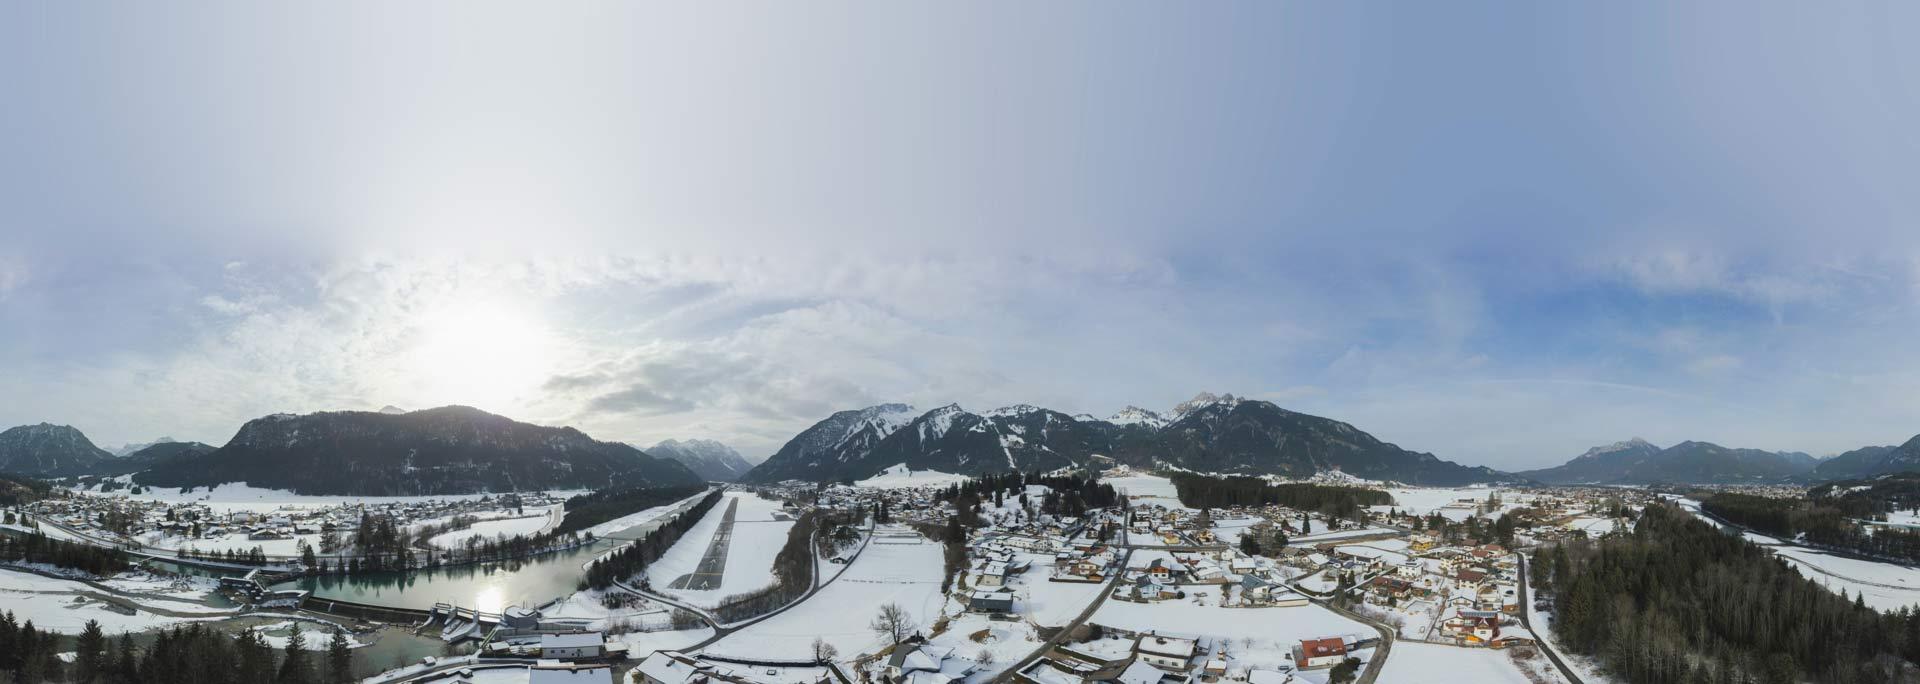 Panorama Aufnahme Schweiz